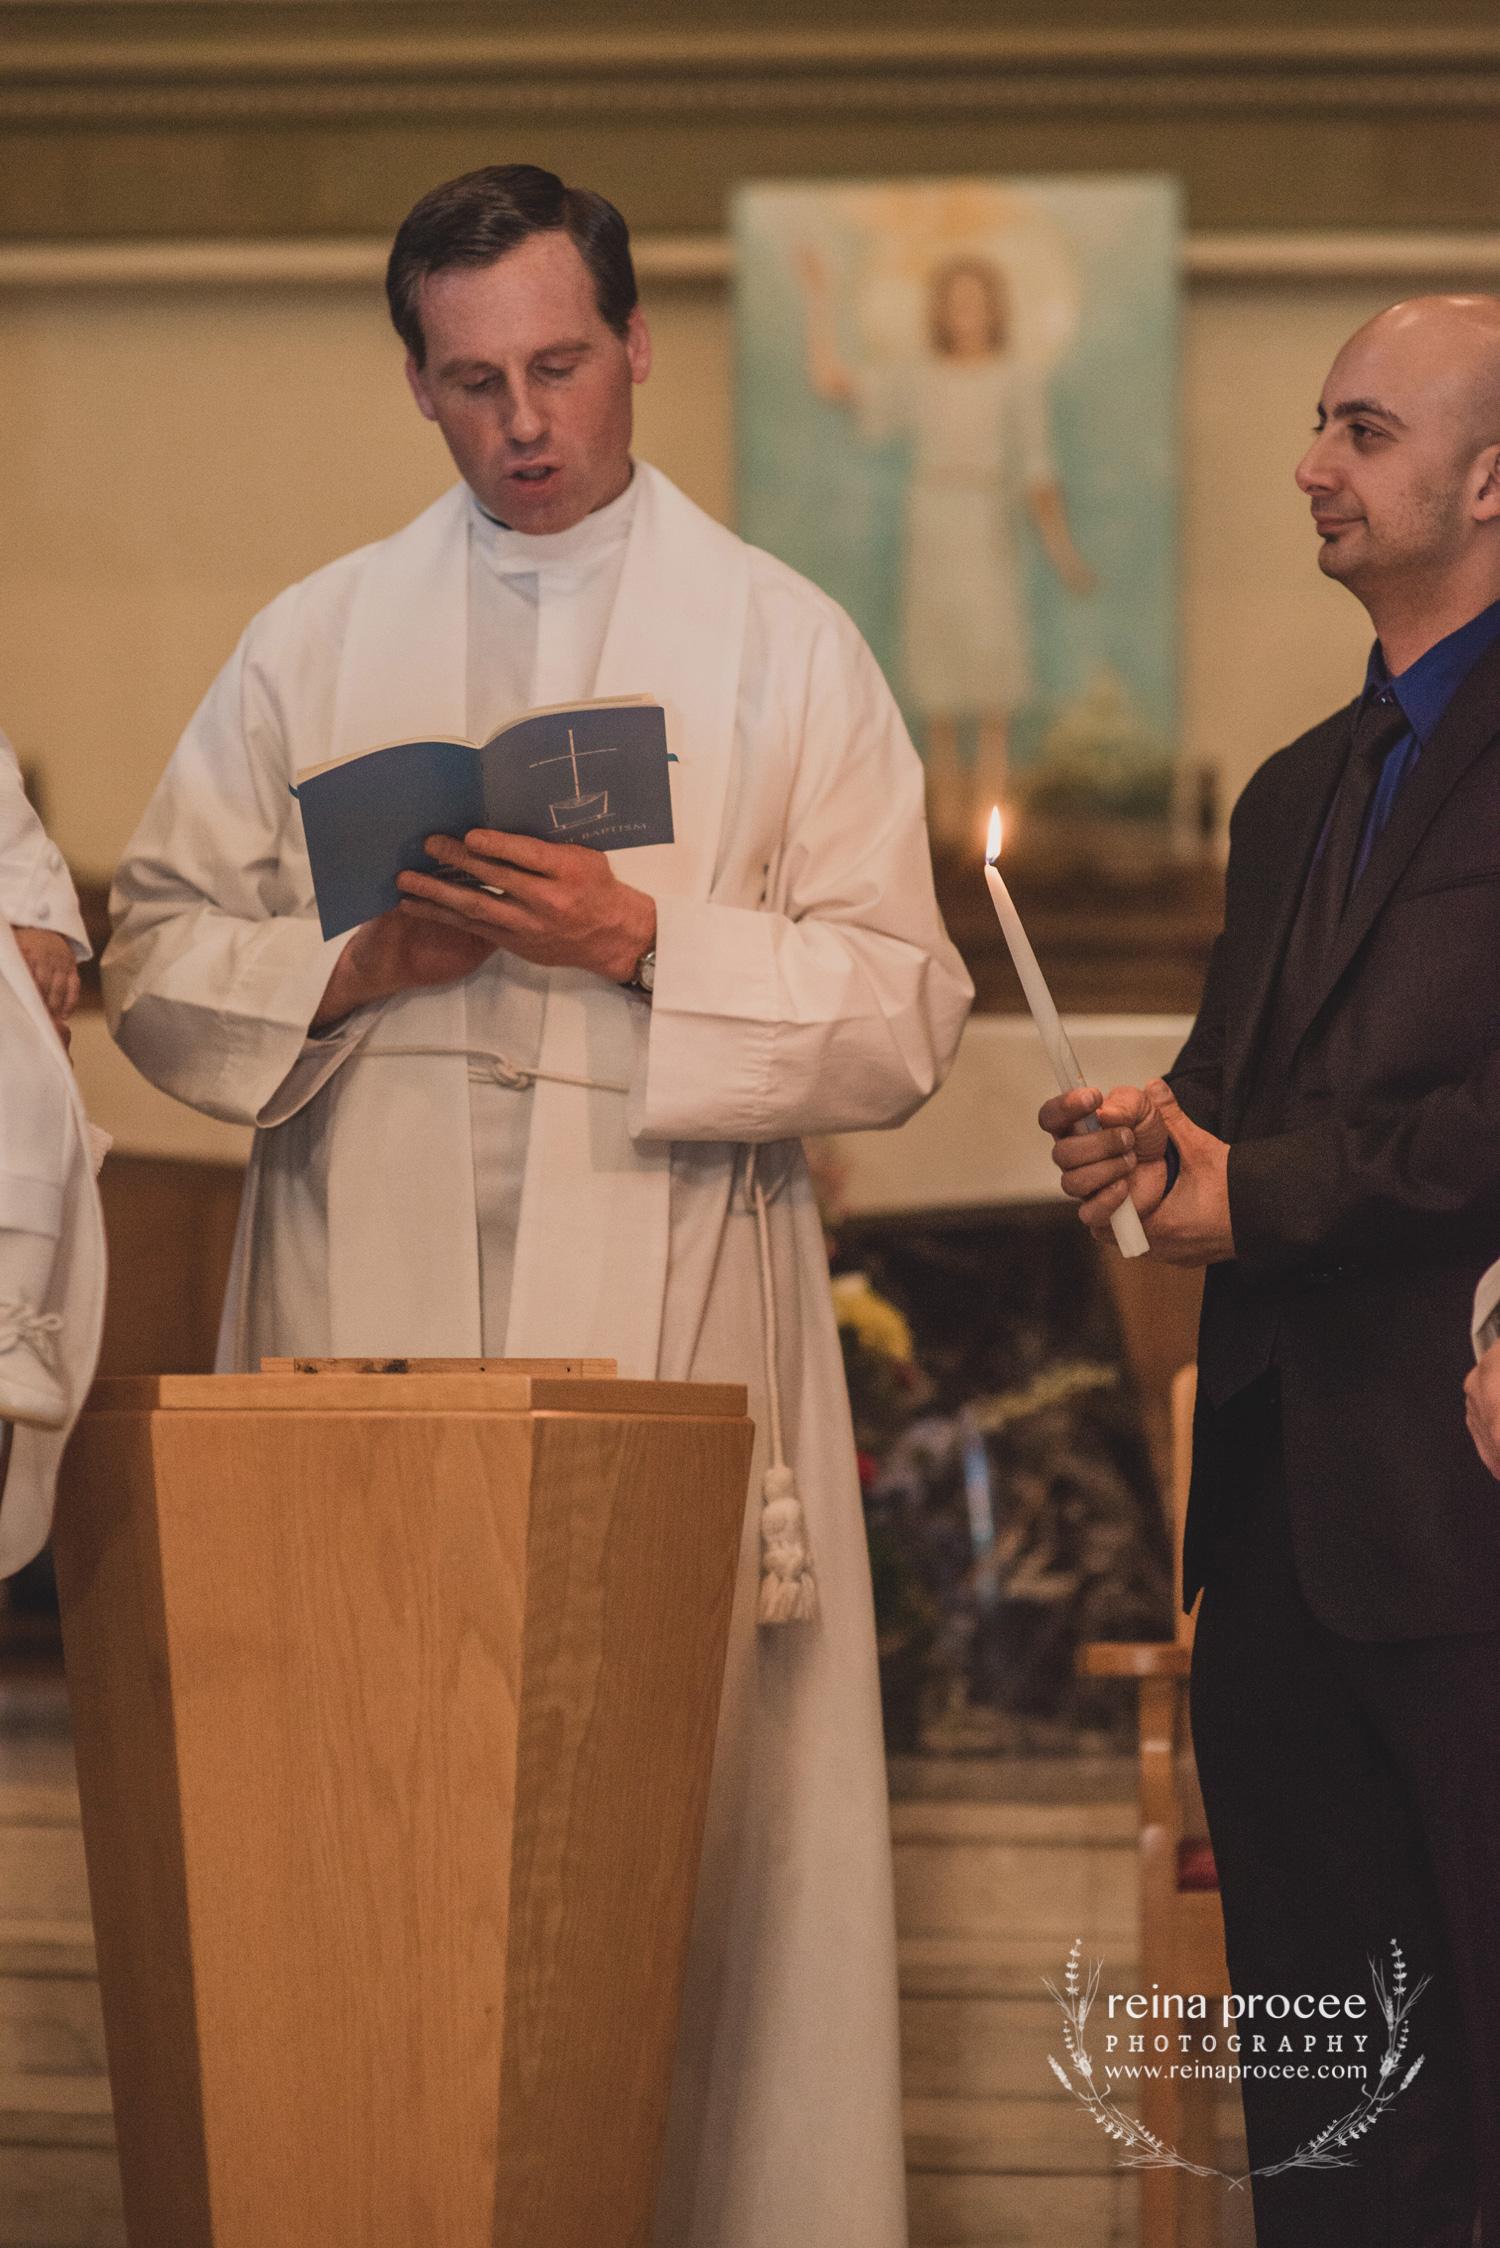 047-baptism-photographer-montreal-family-best-photos-portraits.jpg